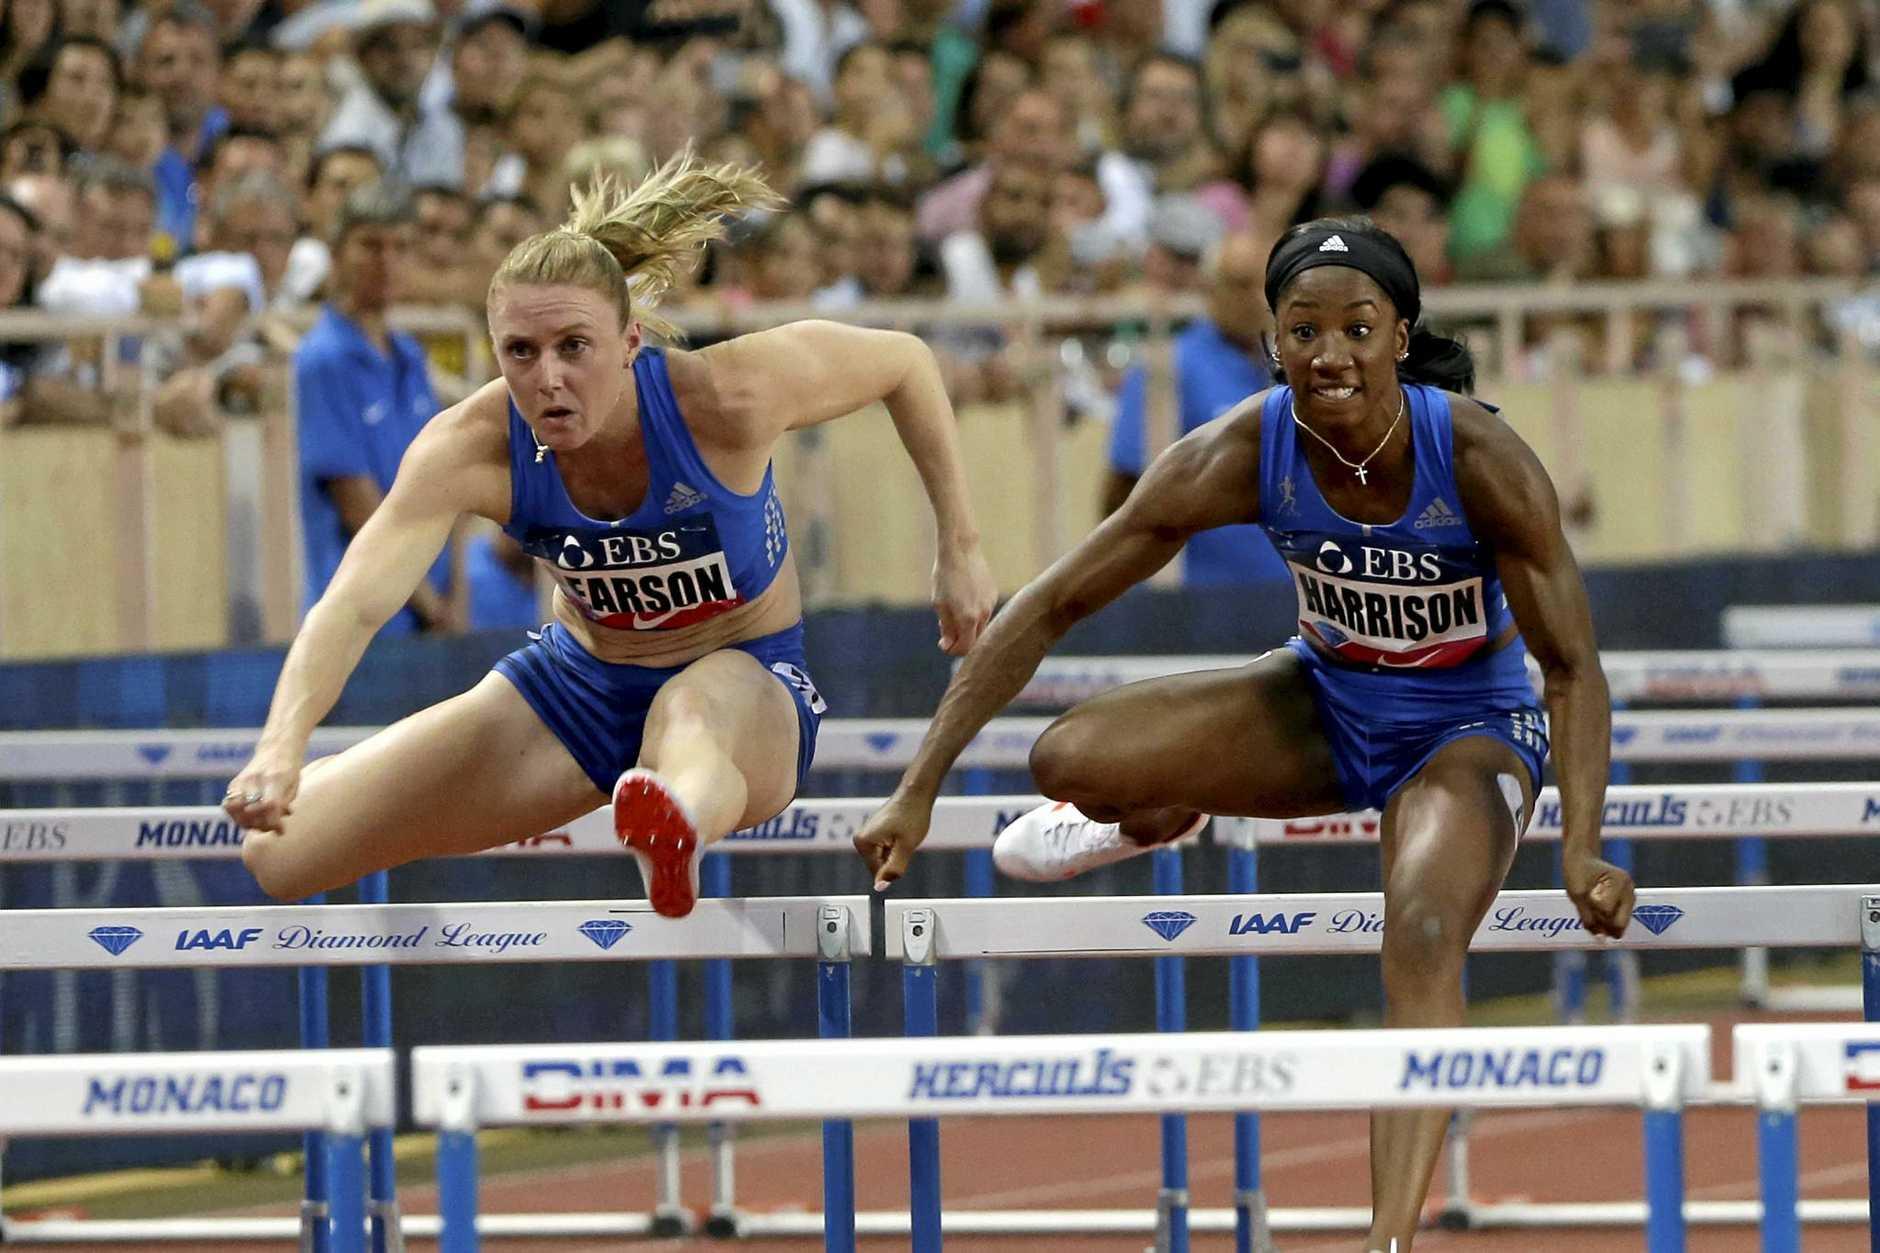 Australia's Sally Pearson (left) racing the USA's Kendra Harrison in the women' s 100m hurdles at the IAAF Diamond League meeting in Monaco.